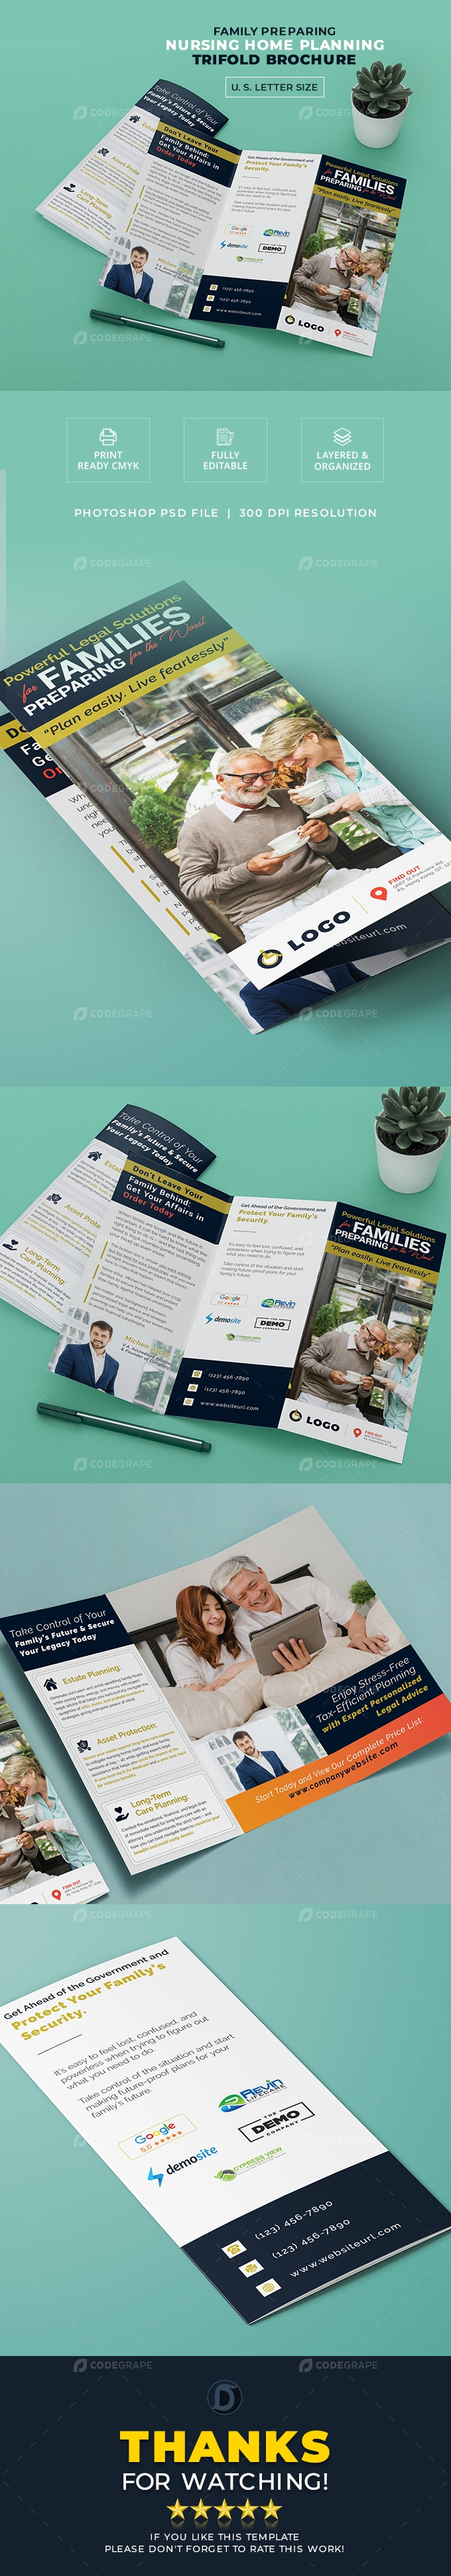 Nursing Home Planning Trifold Brochure